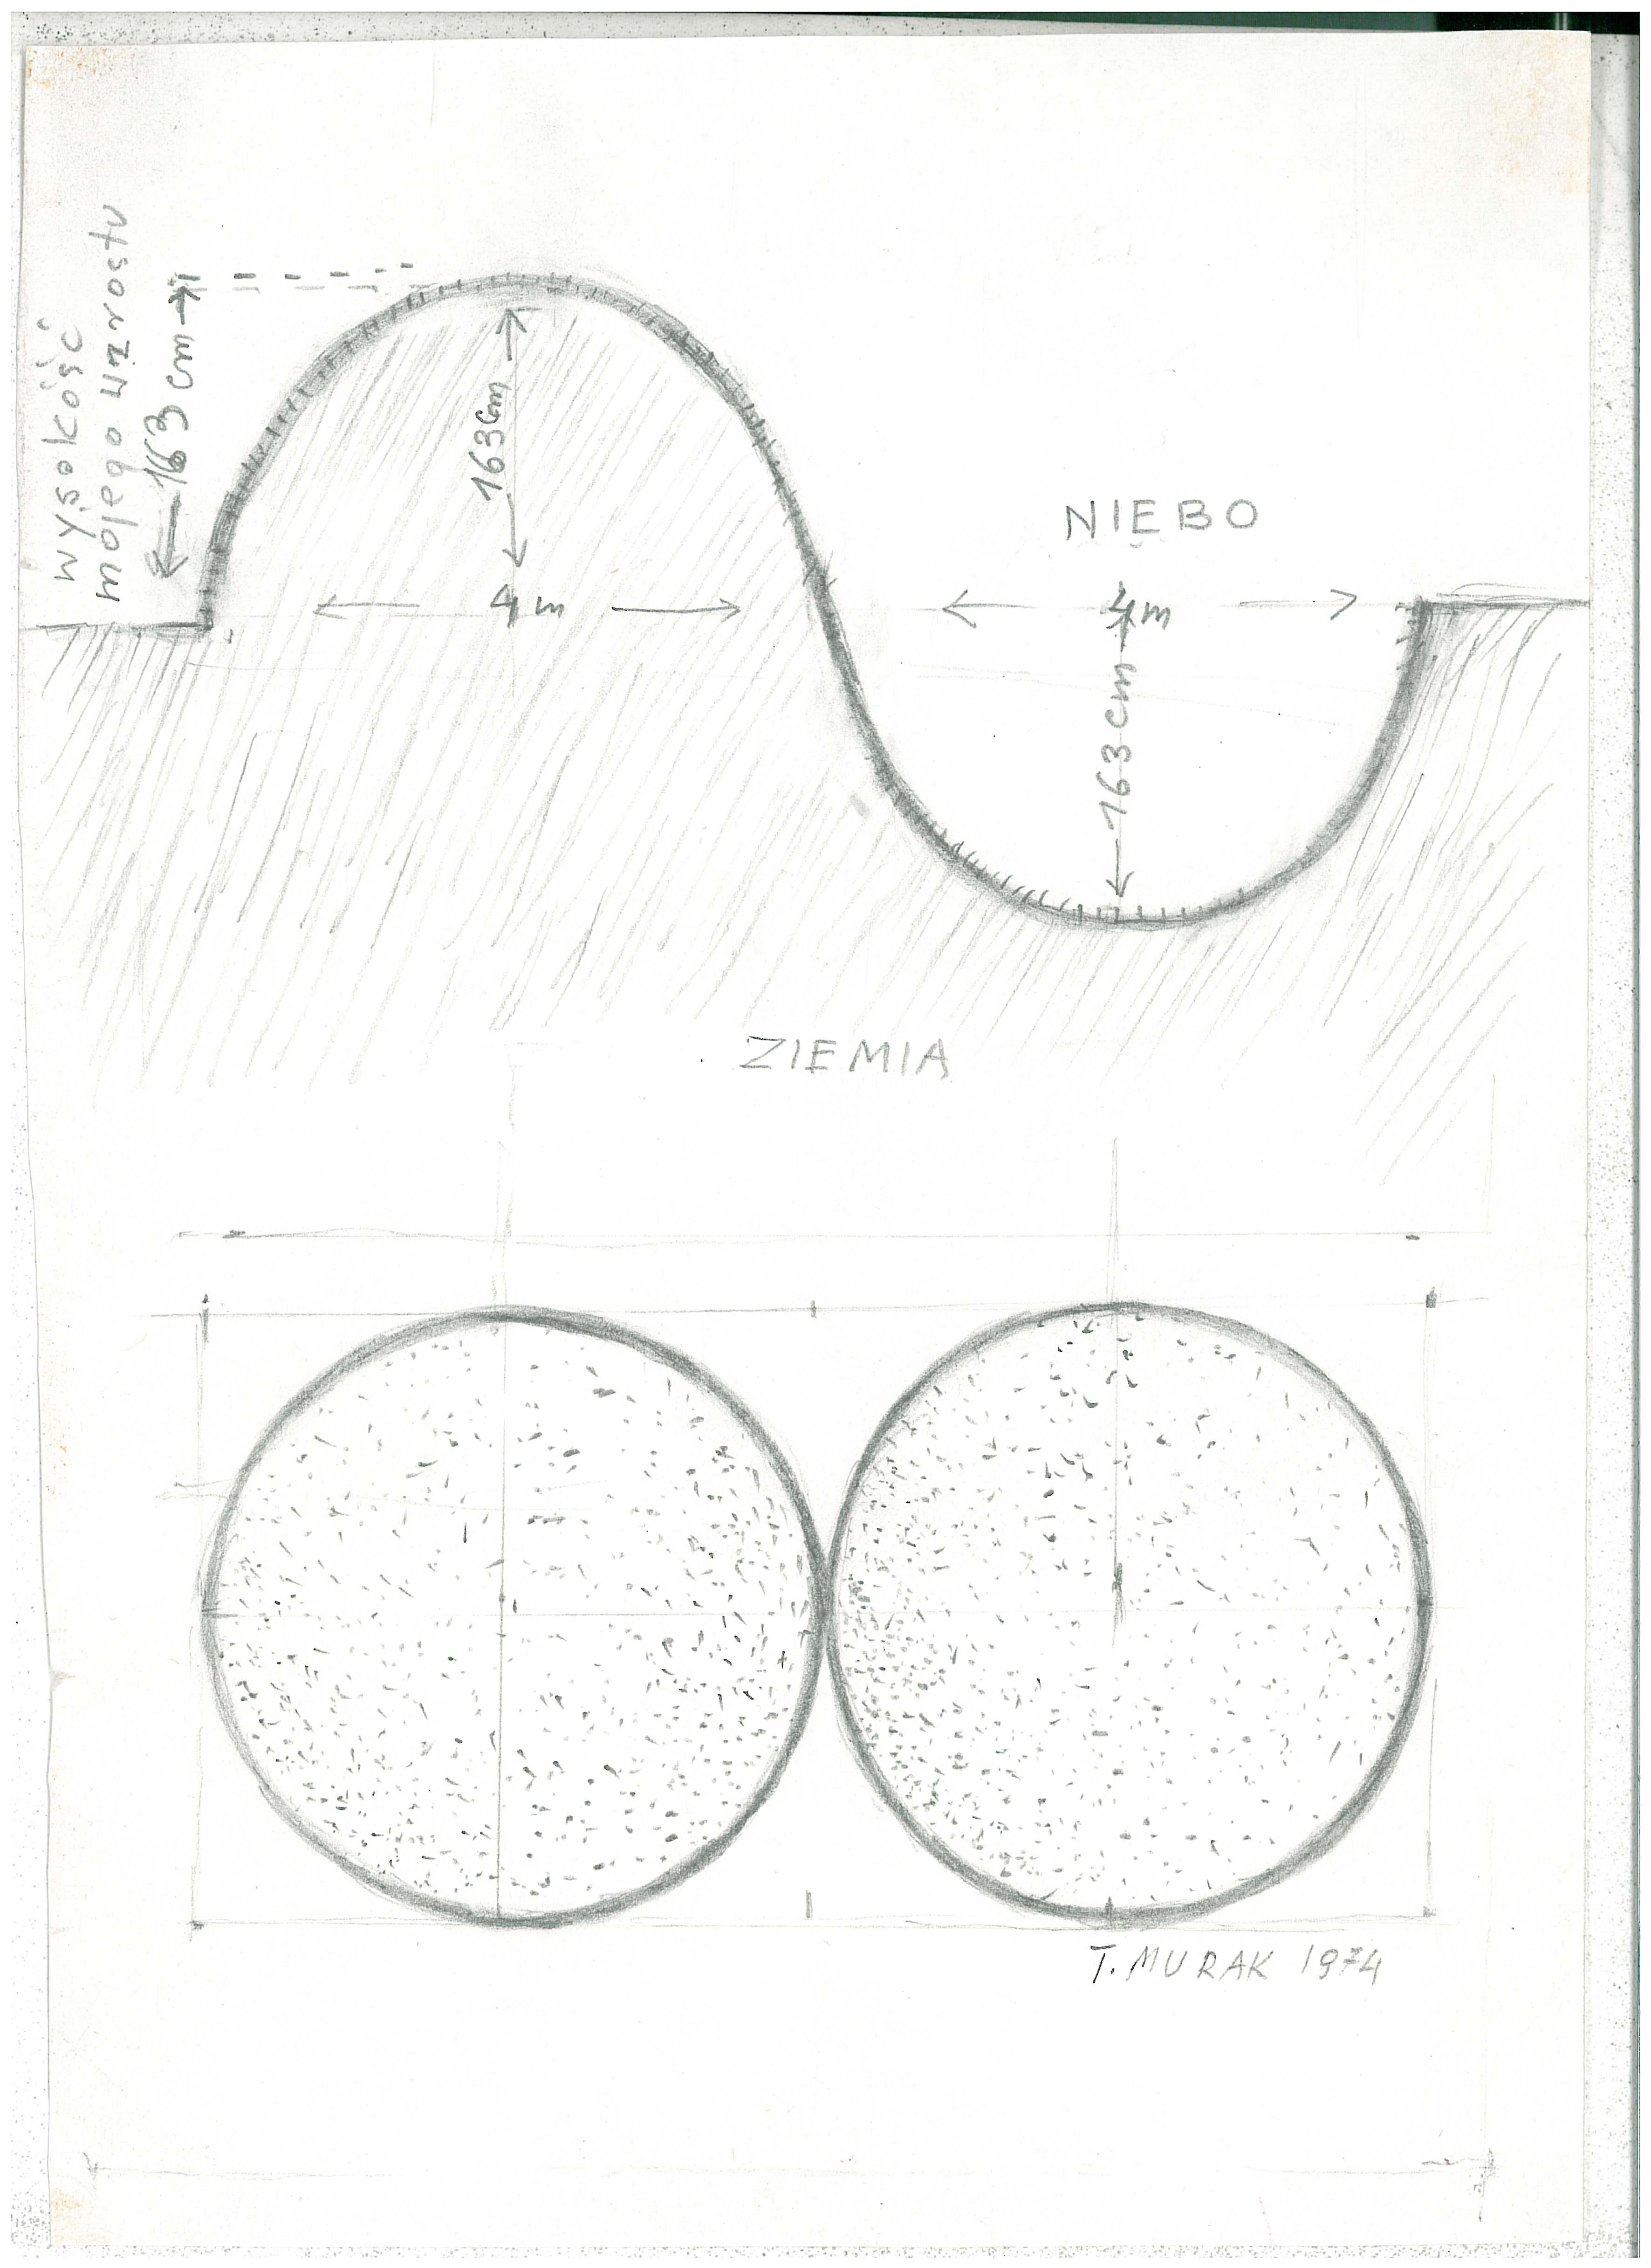 Teresa Murak, projekt Rzeźby dla Ziemi, 1974